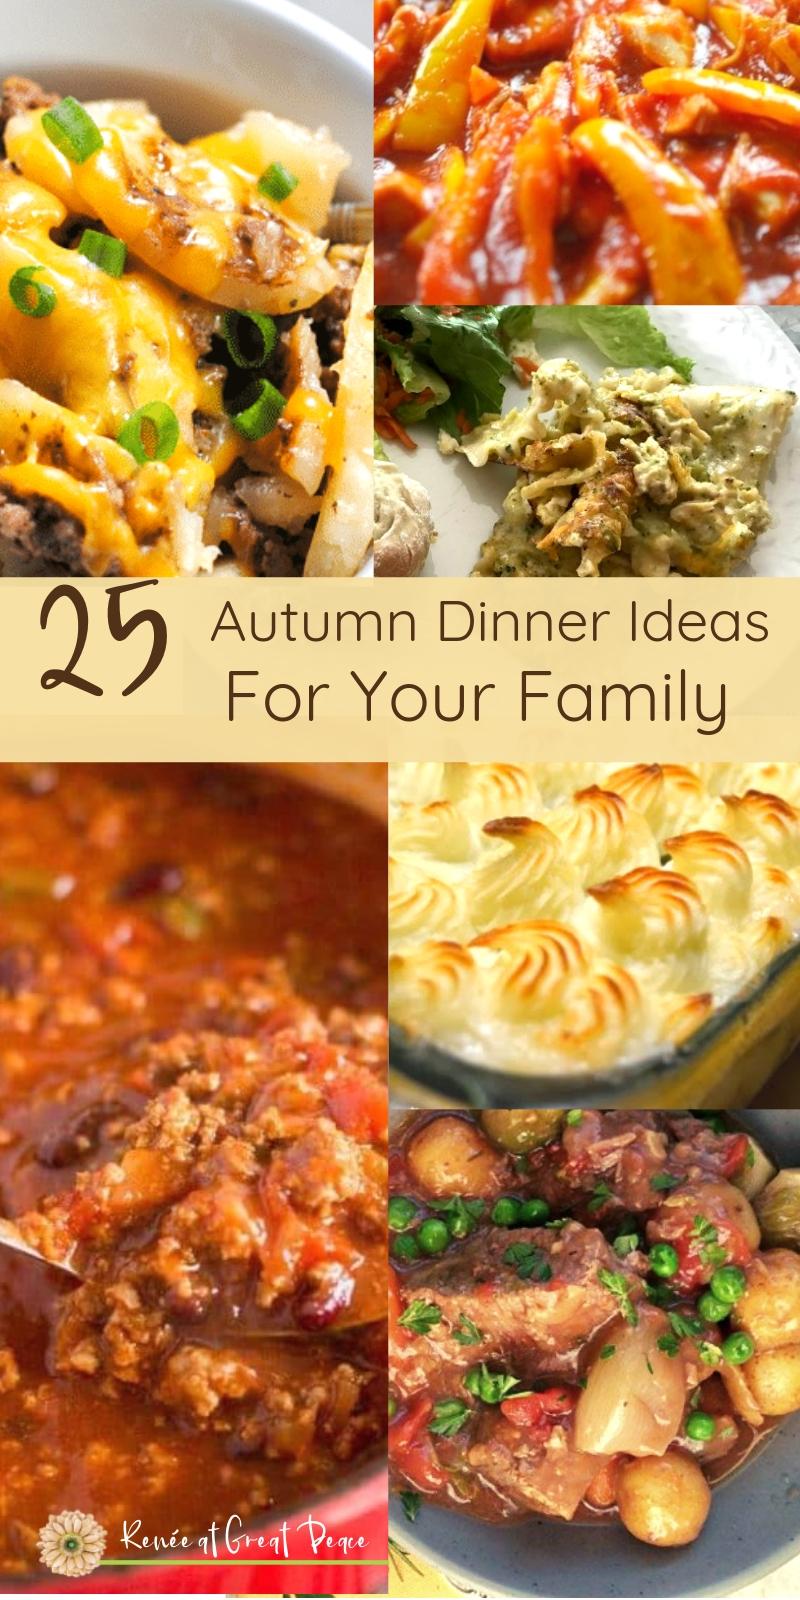 25 Autumn Dinner Ideas for your Family   Renée at Great Peace #mealplanning #autumndinnerideas #dinner